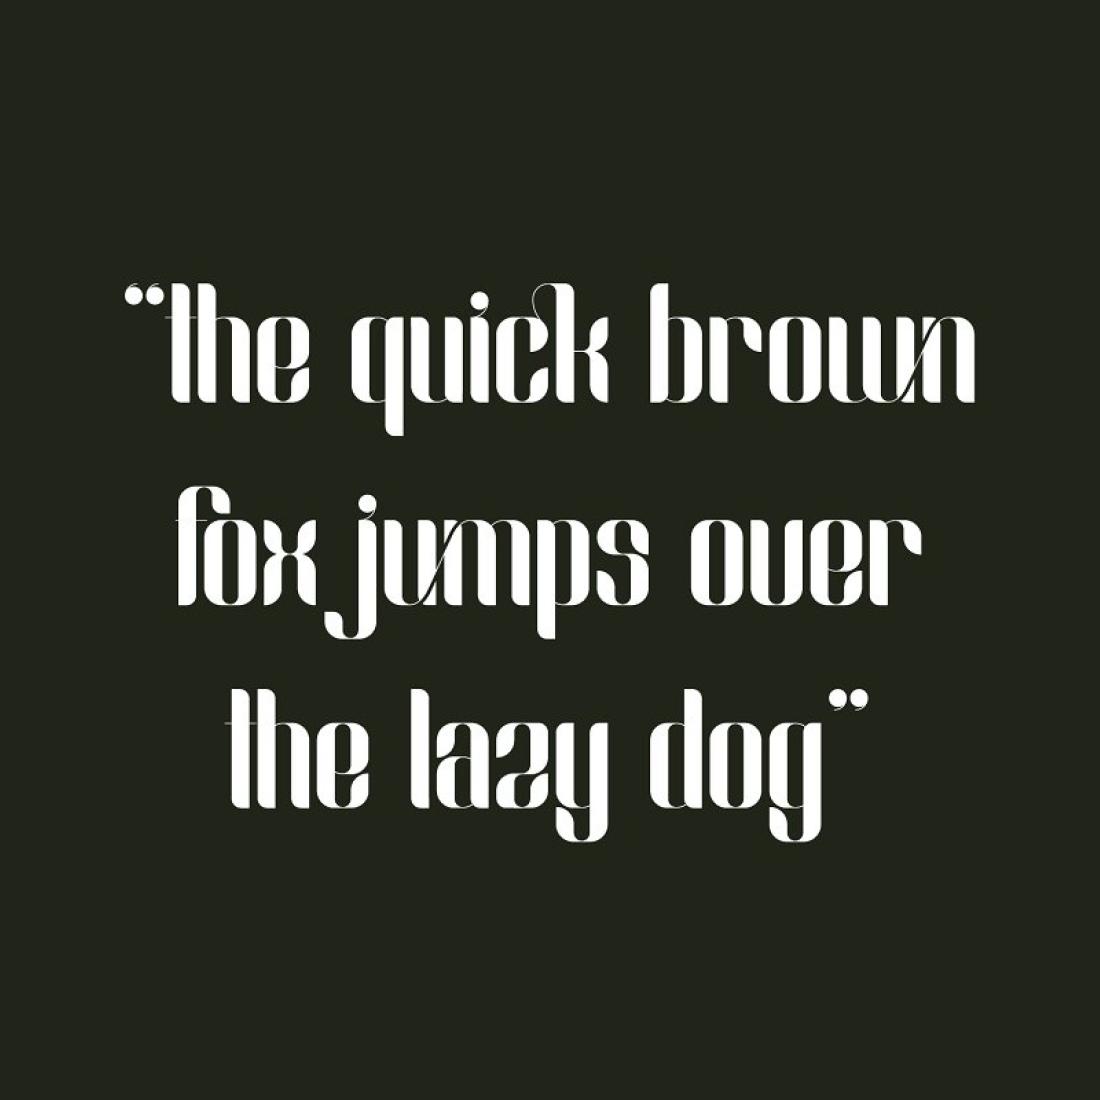 Slang – Classic Ligature Font cover image.